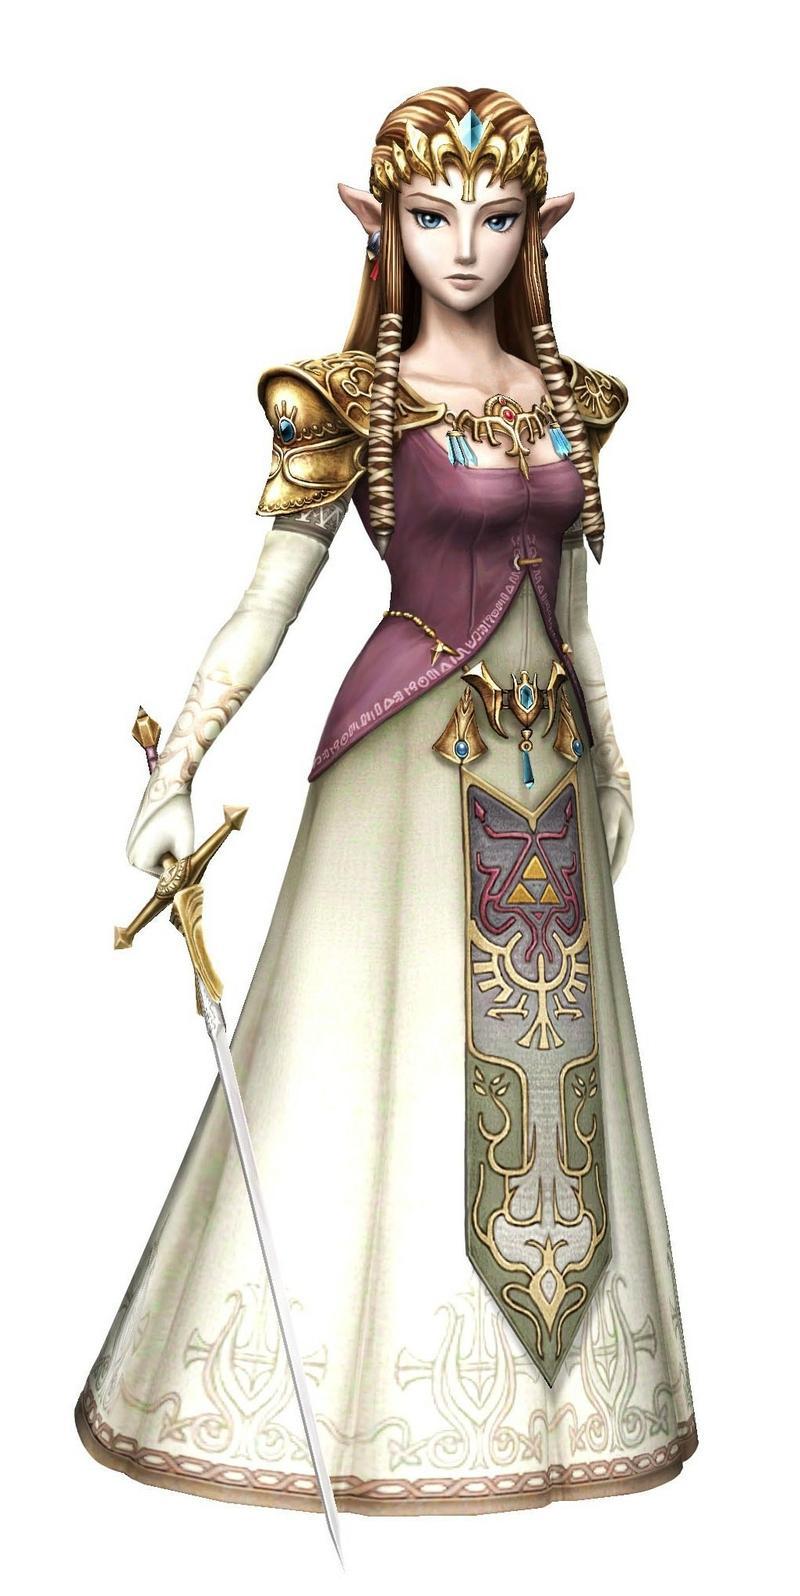 The Legend of Zelda,Princess Zelda the legend of zelda princess zelda 1026x2048 wallpaper – The Legend of Zelda,Princess Zelda the legend of zelda princess zelda 1026x2048 wallpaper – Zelda Wallpaper – Desktop Wallpaper